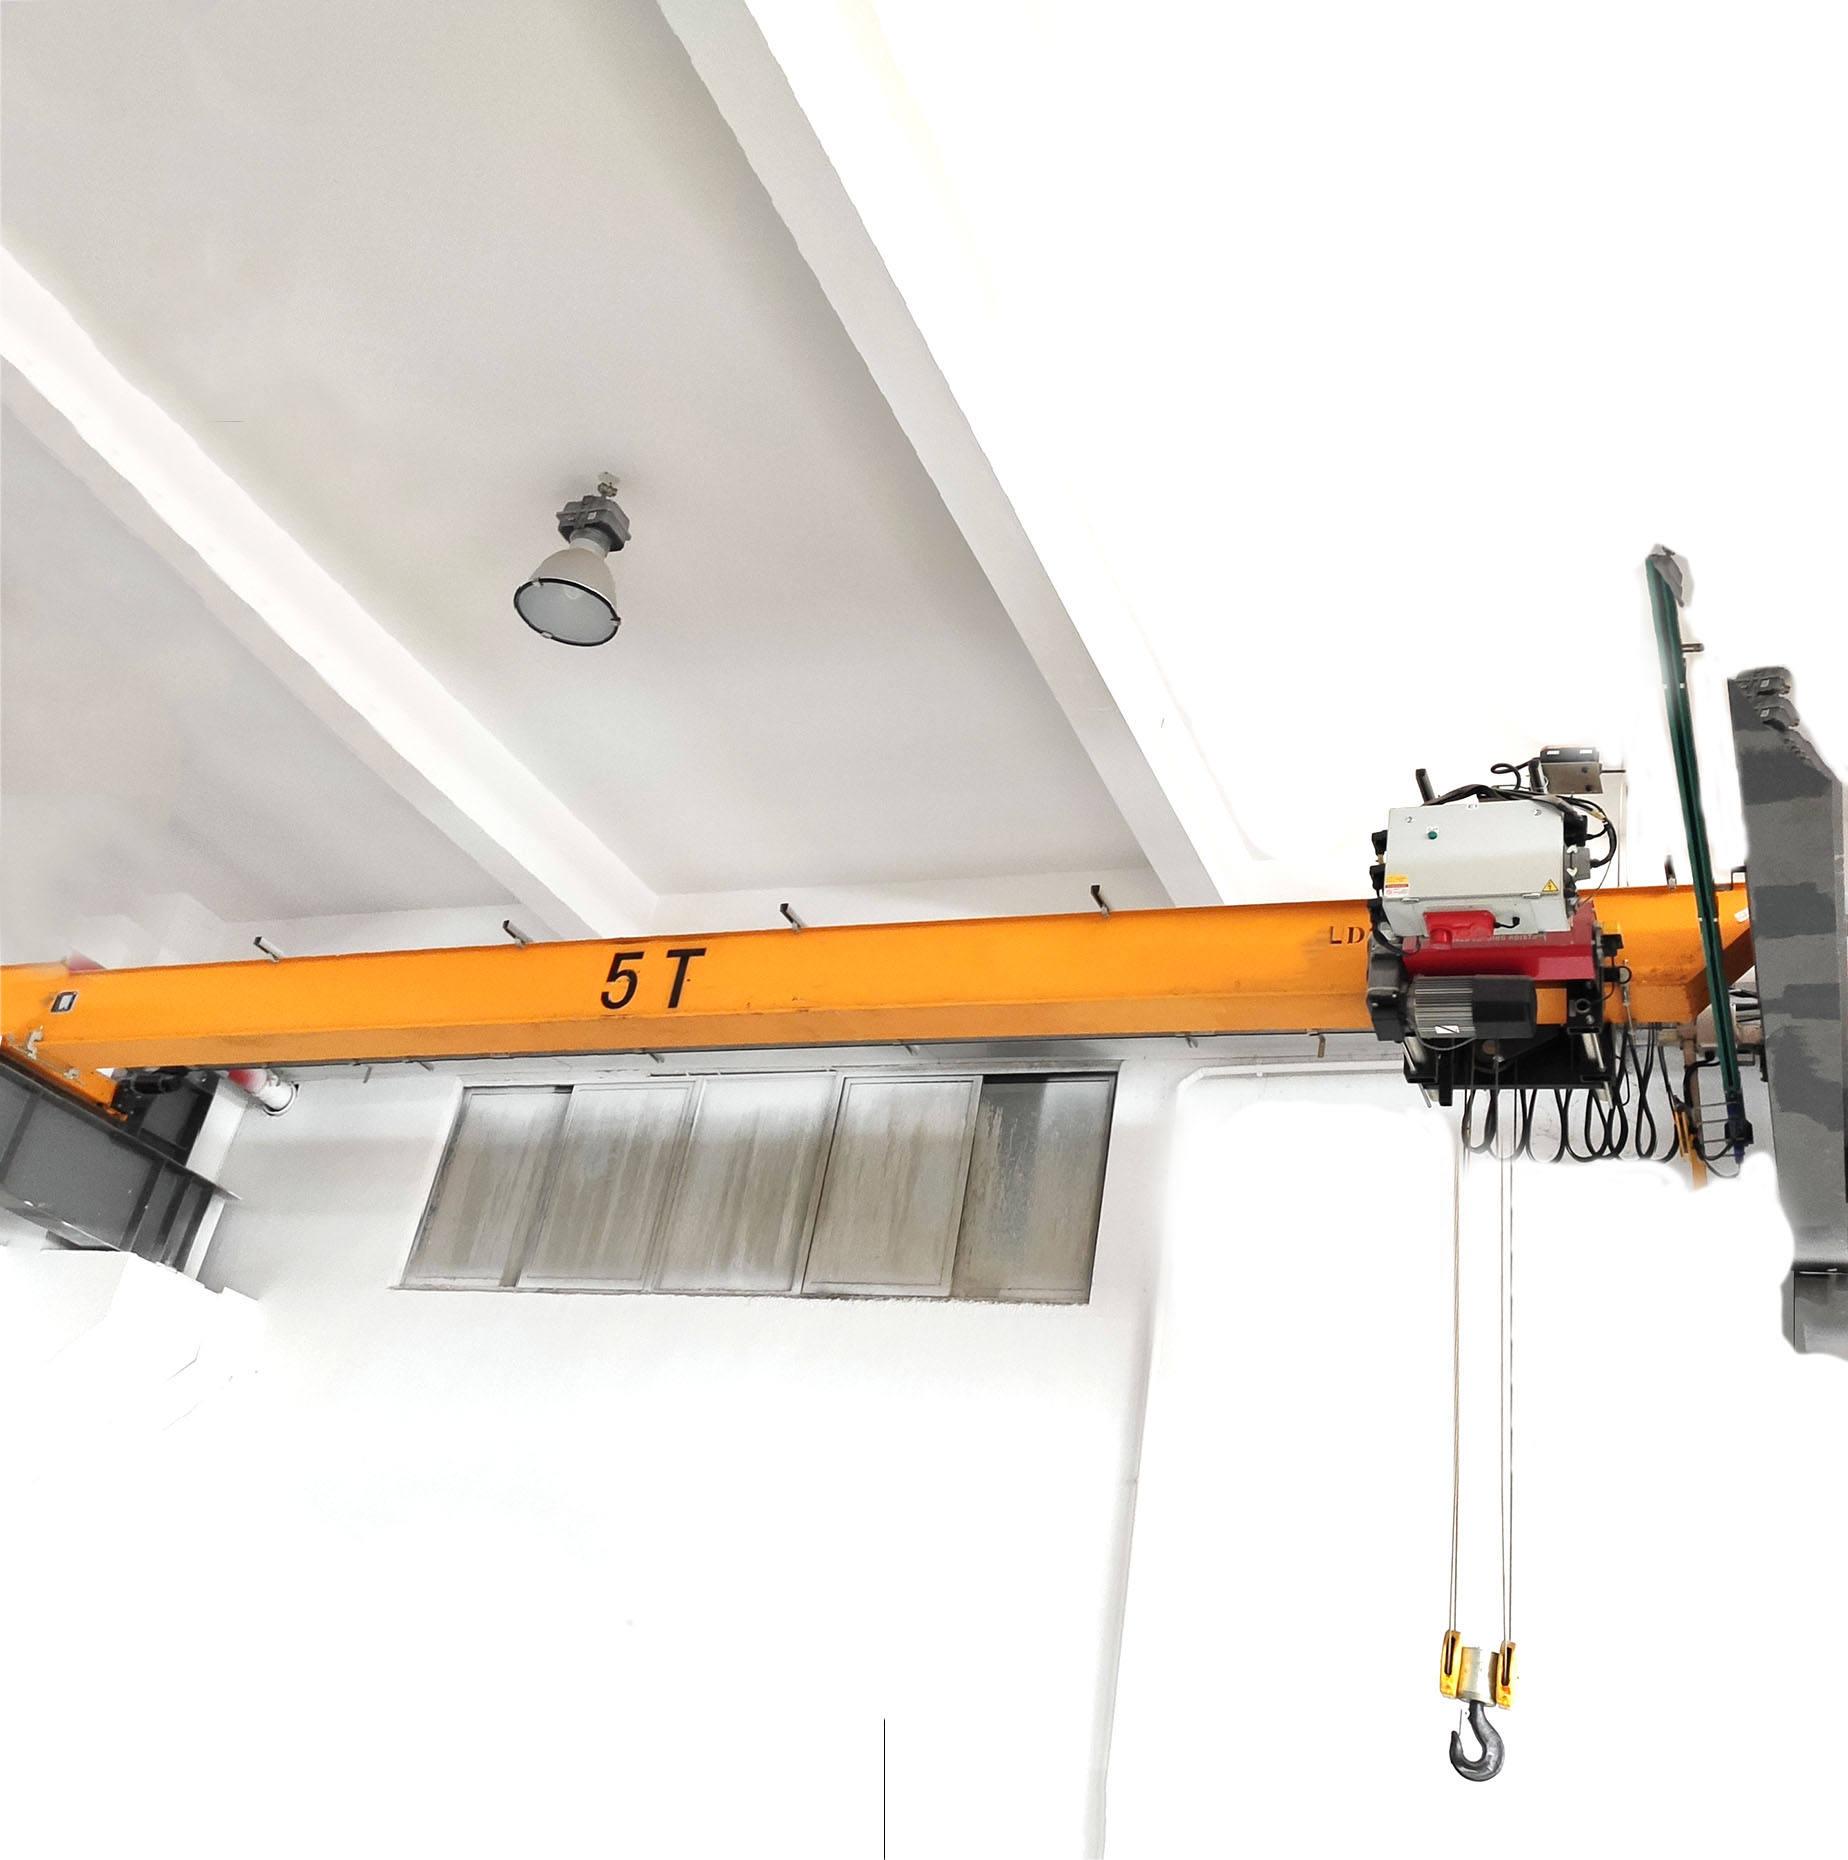 Factory use 5ton hoist crane travelling motor bridge electric hoist overhead crane